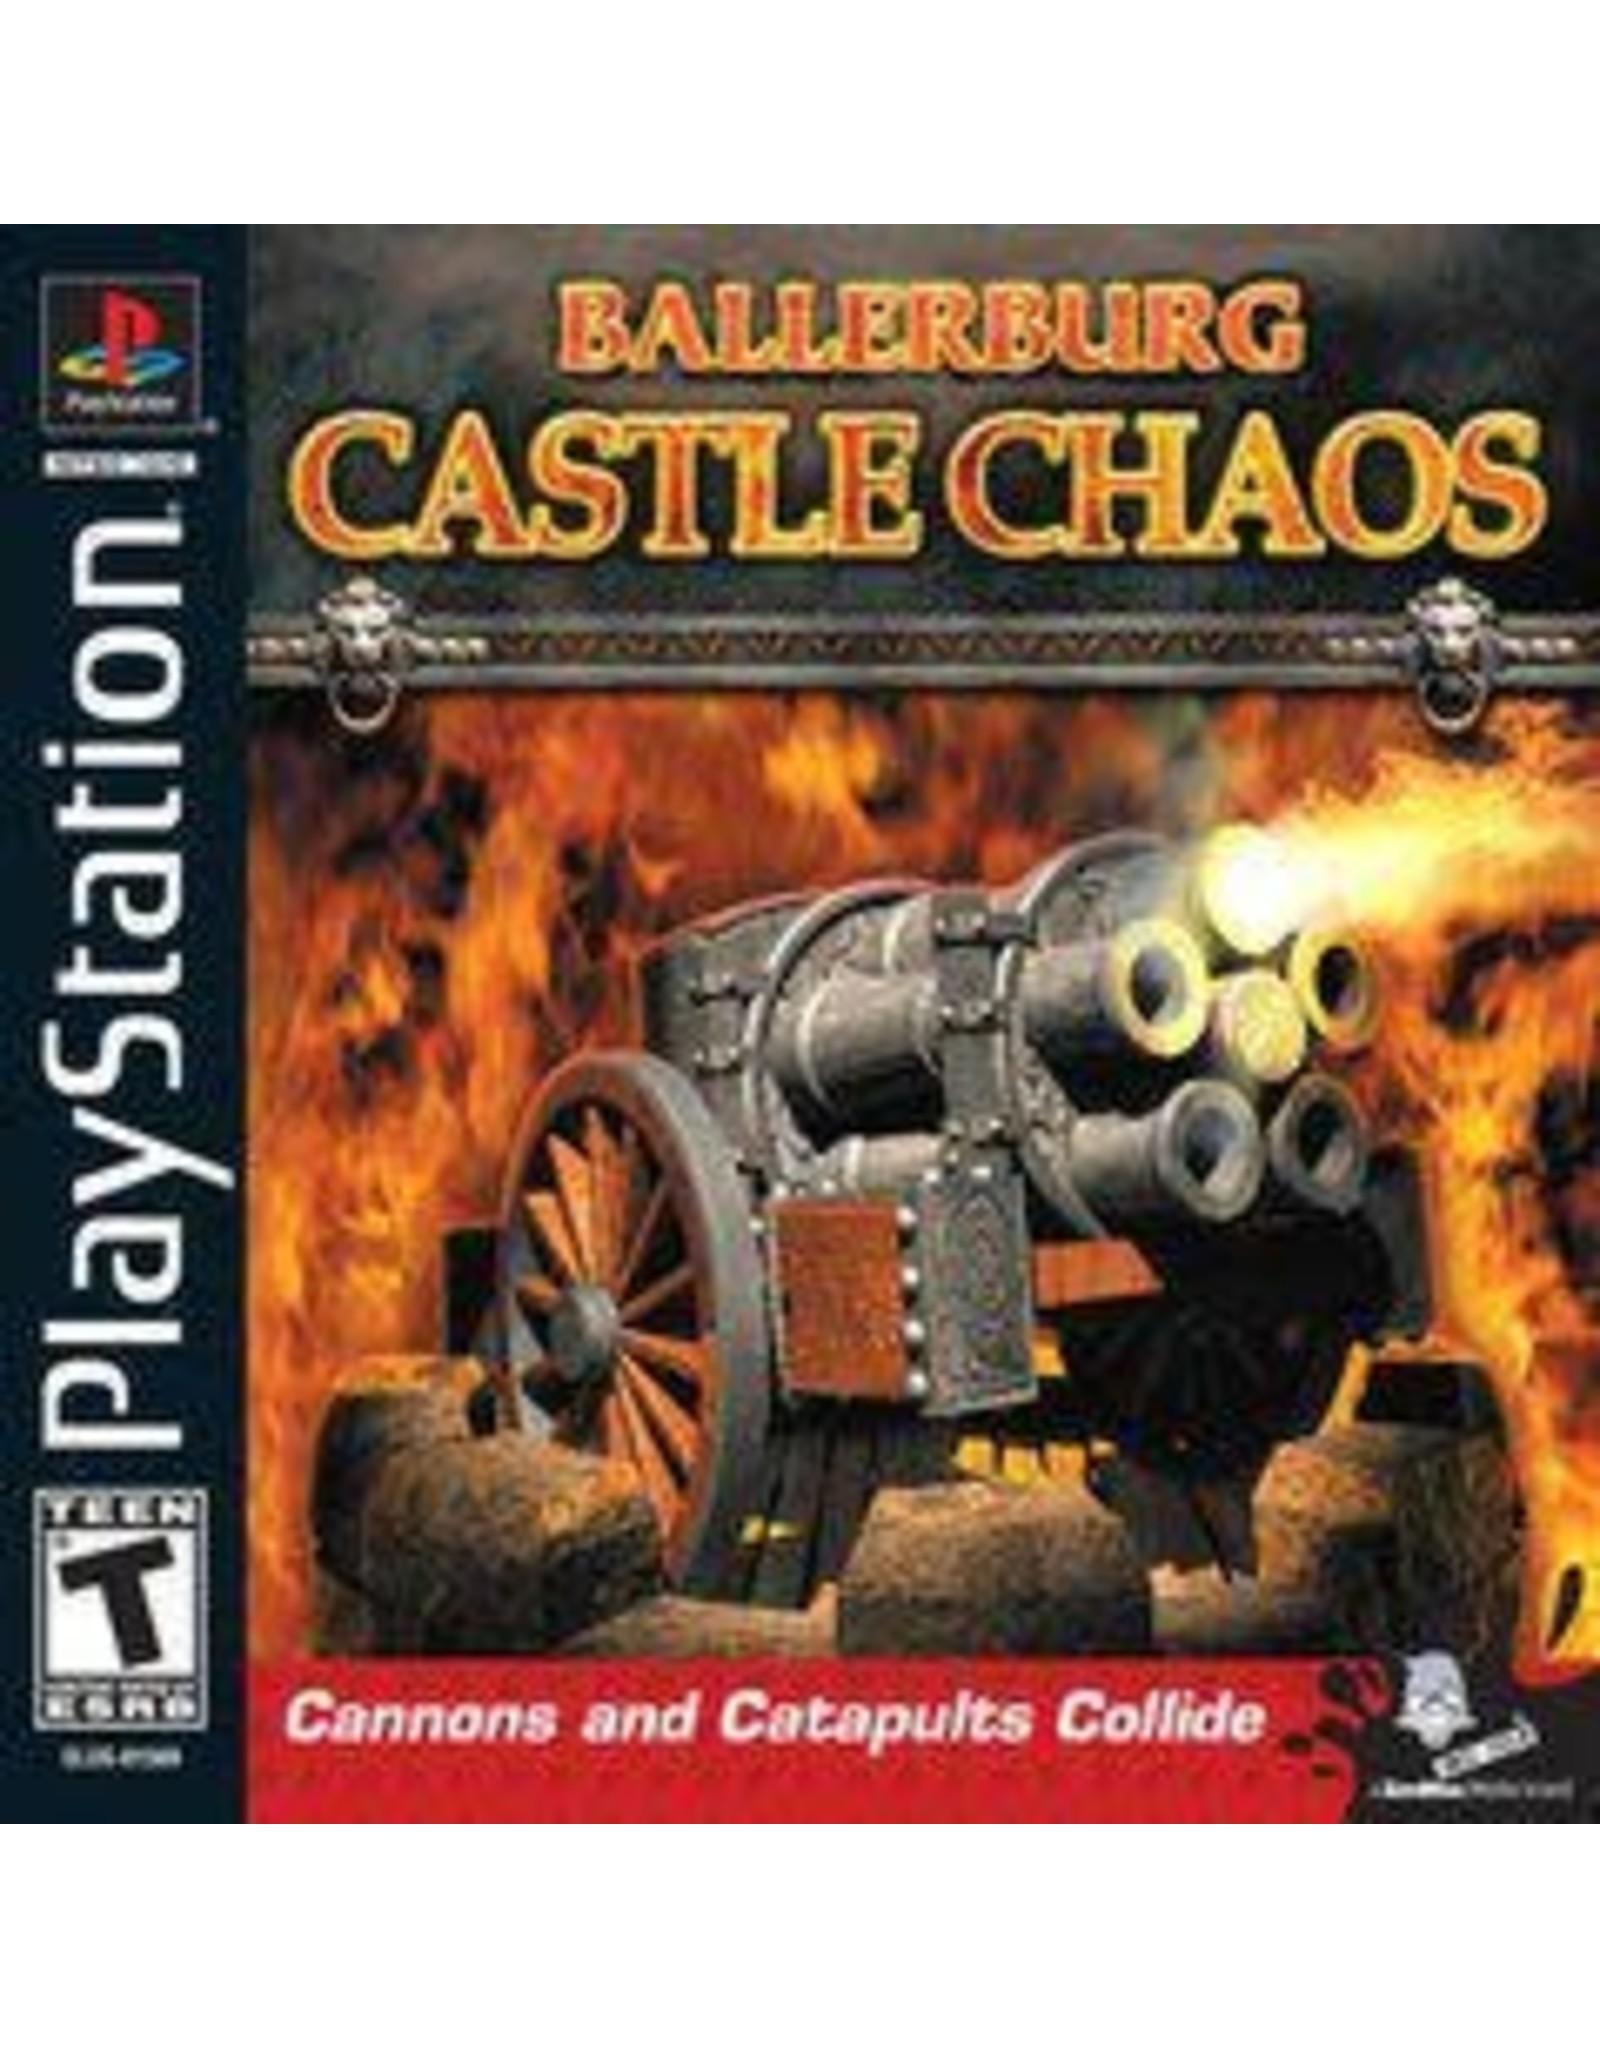 Playstation Ballerburg Castle Chaos (CiB)